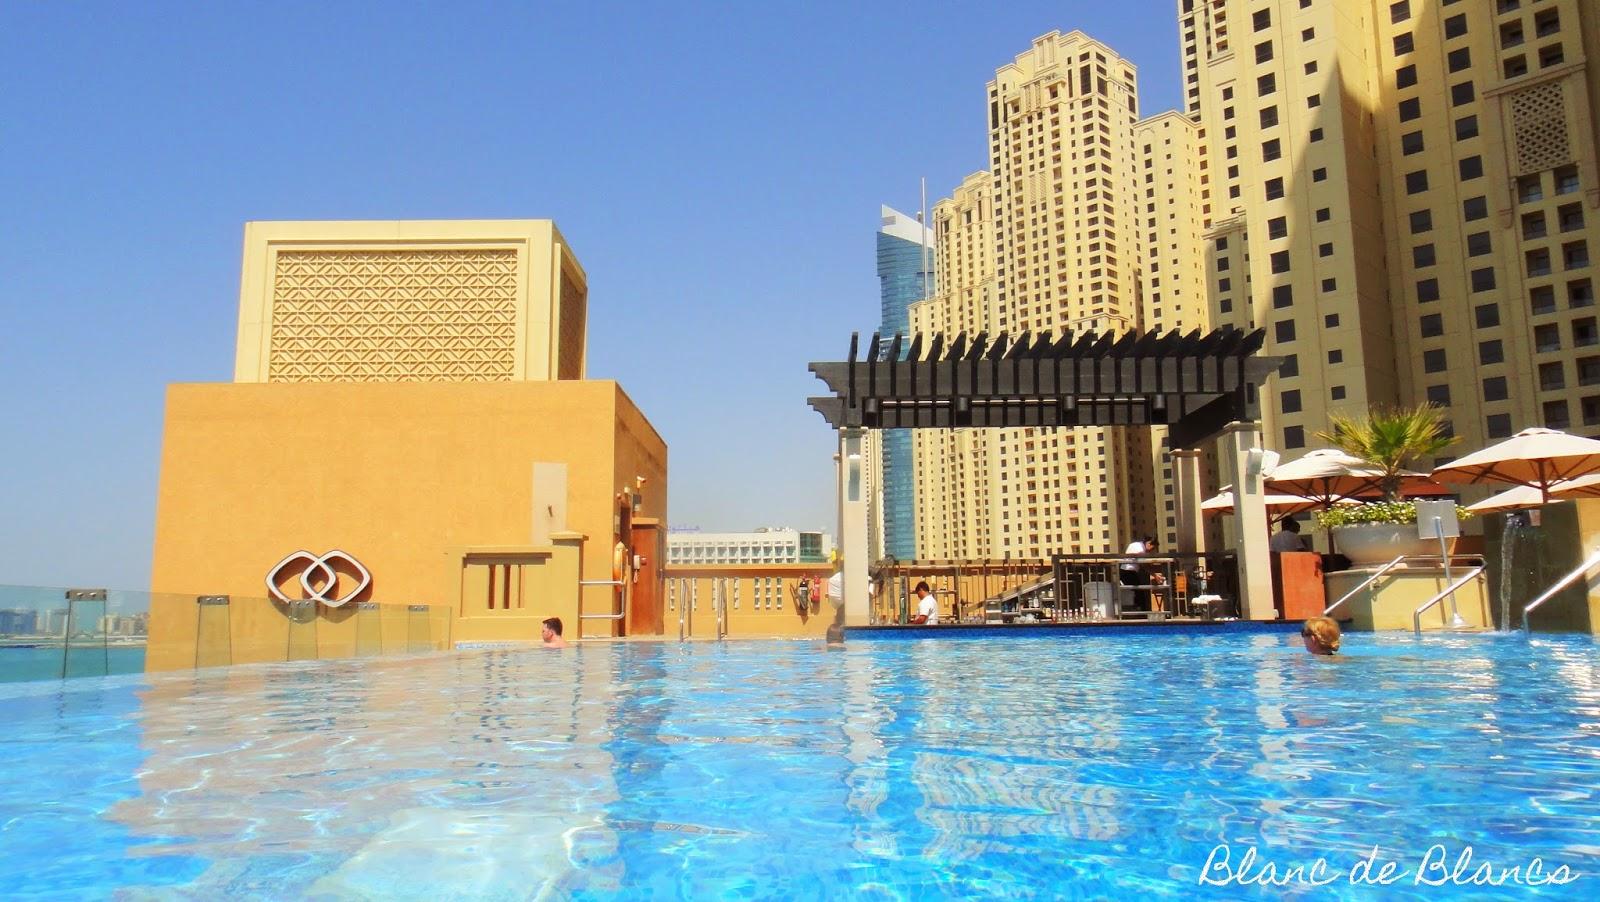 Sofitel Jumeirah Beach infinity pool - www.blancdeblancs.fi